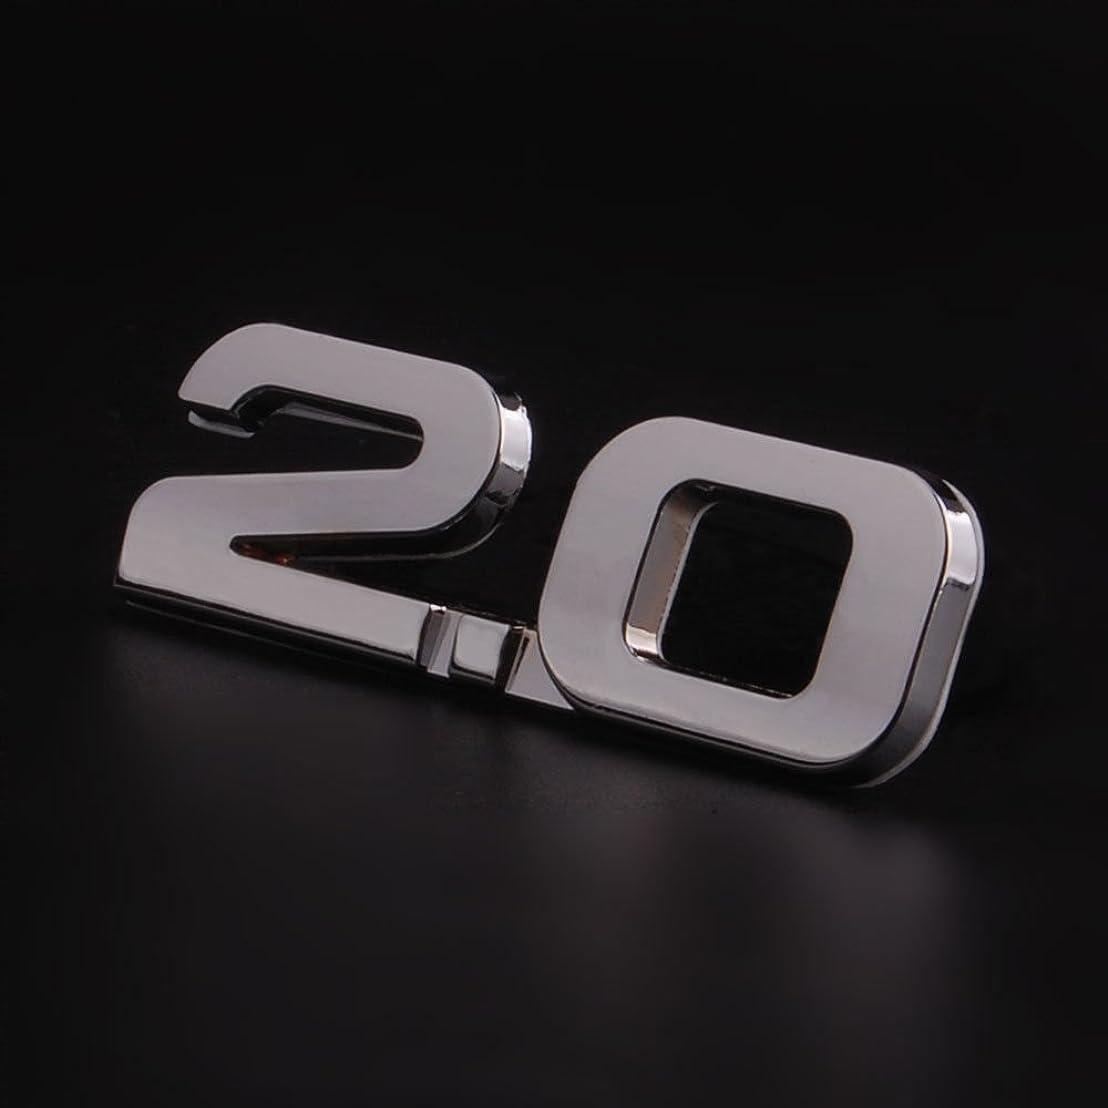 Jicorzo - 3D Car Auto Metal Silver 2.0 2.0T 2.0TSI Rear Trunk Decal Emblem Badge Styling Sticker